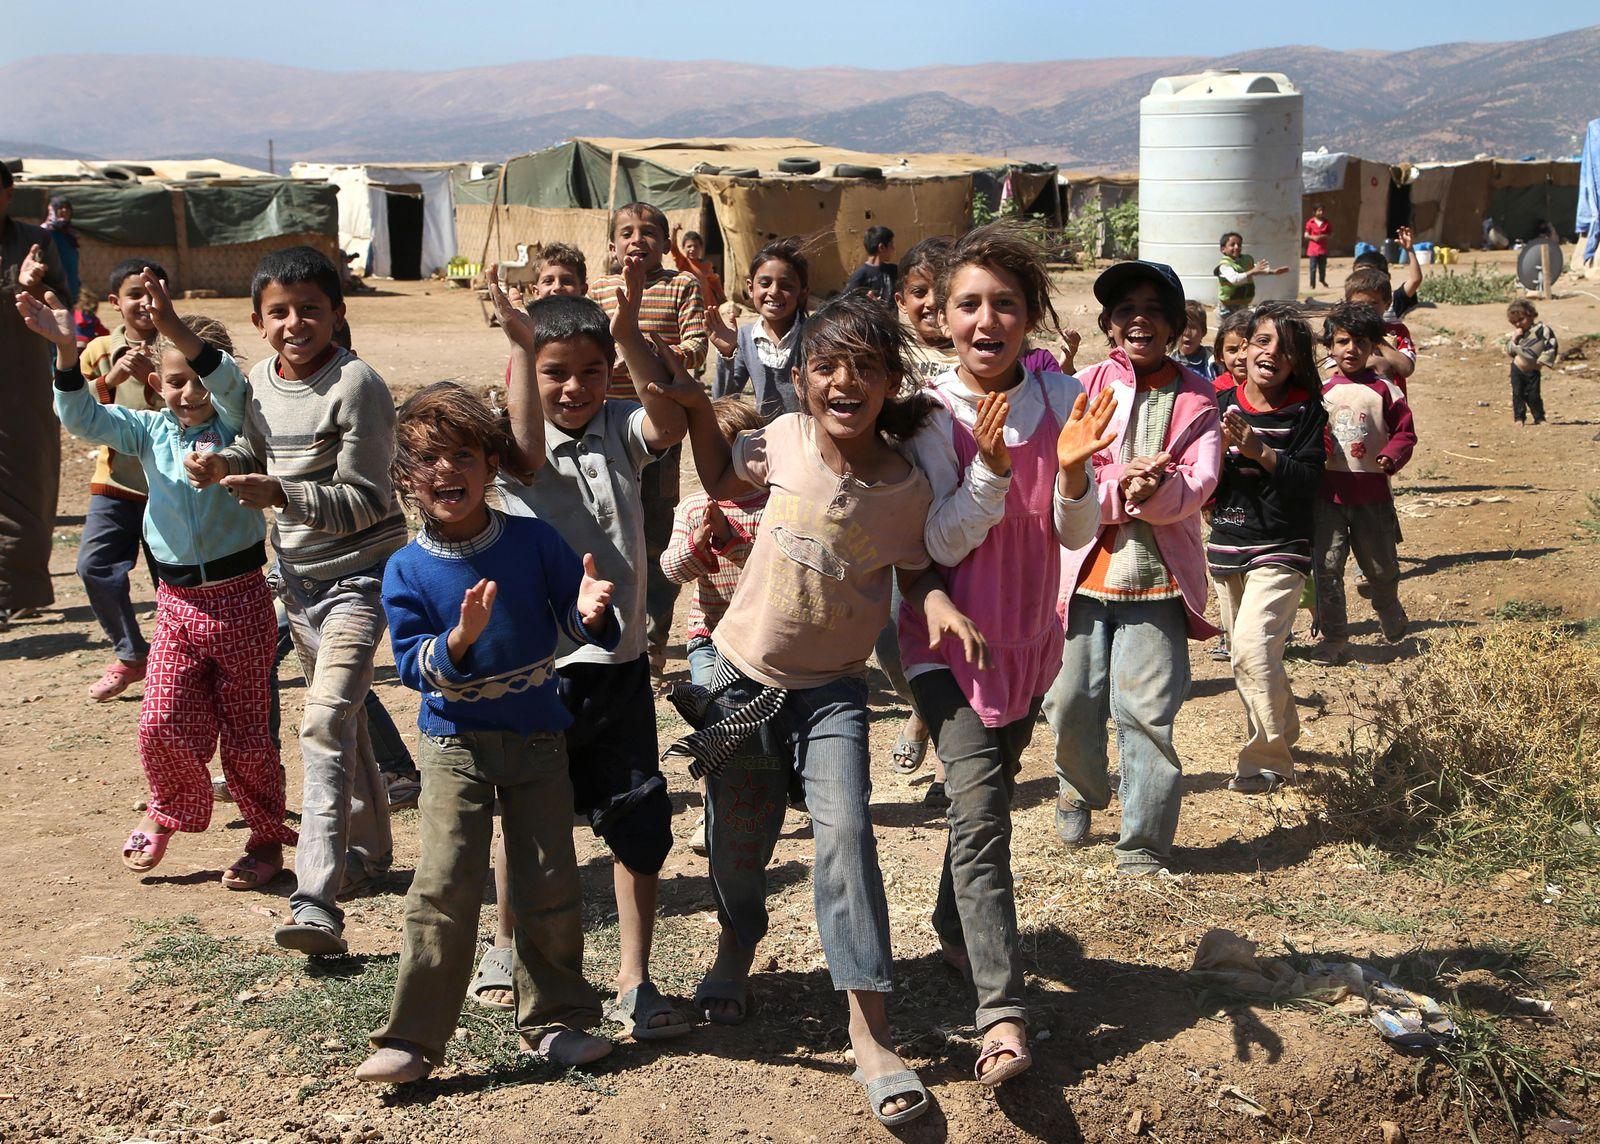 Libanon UNHCR Flüchtlinge